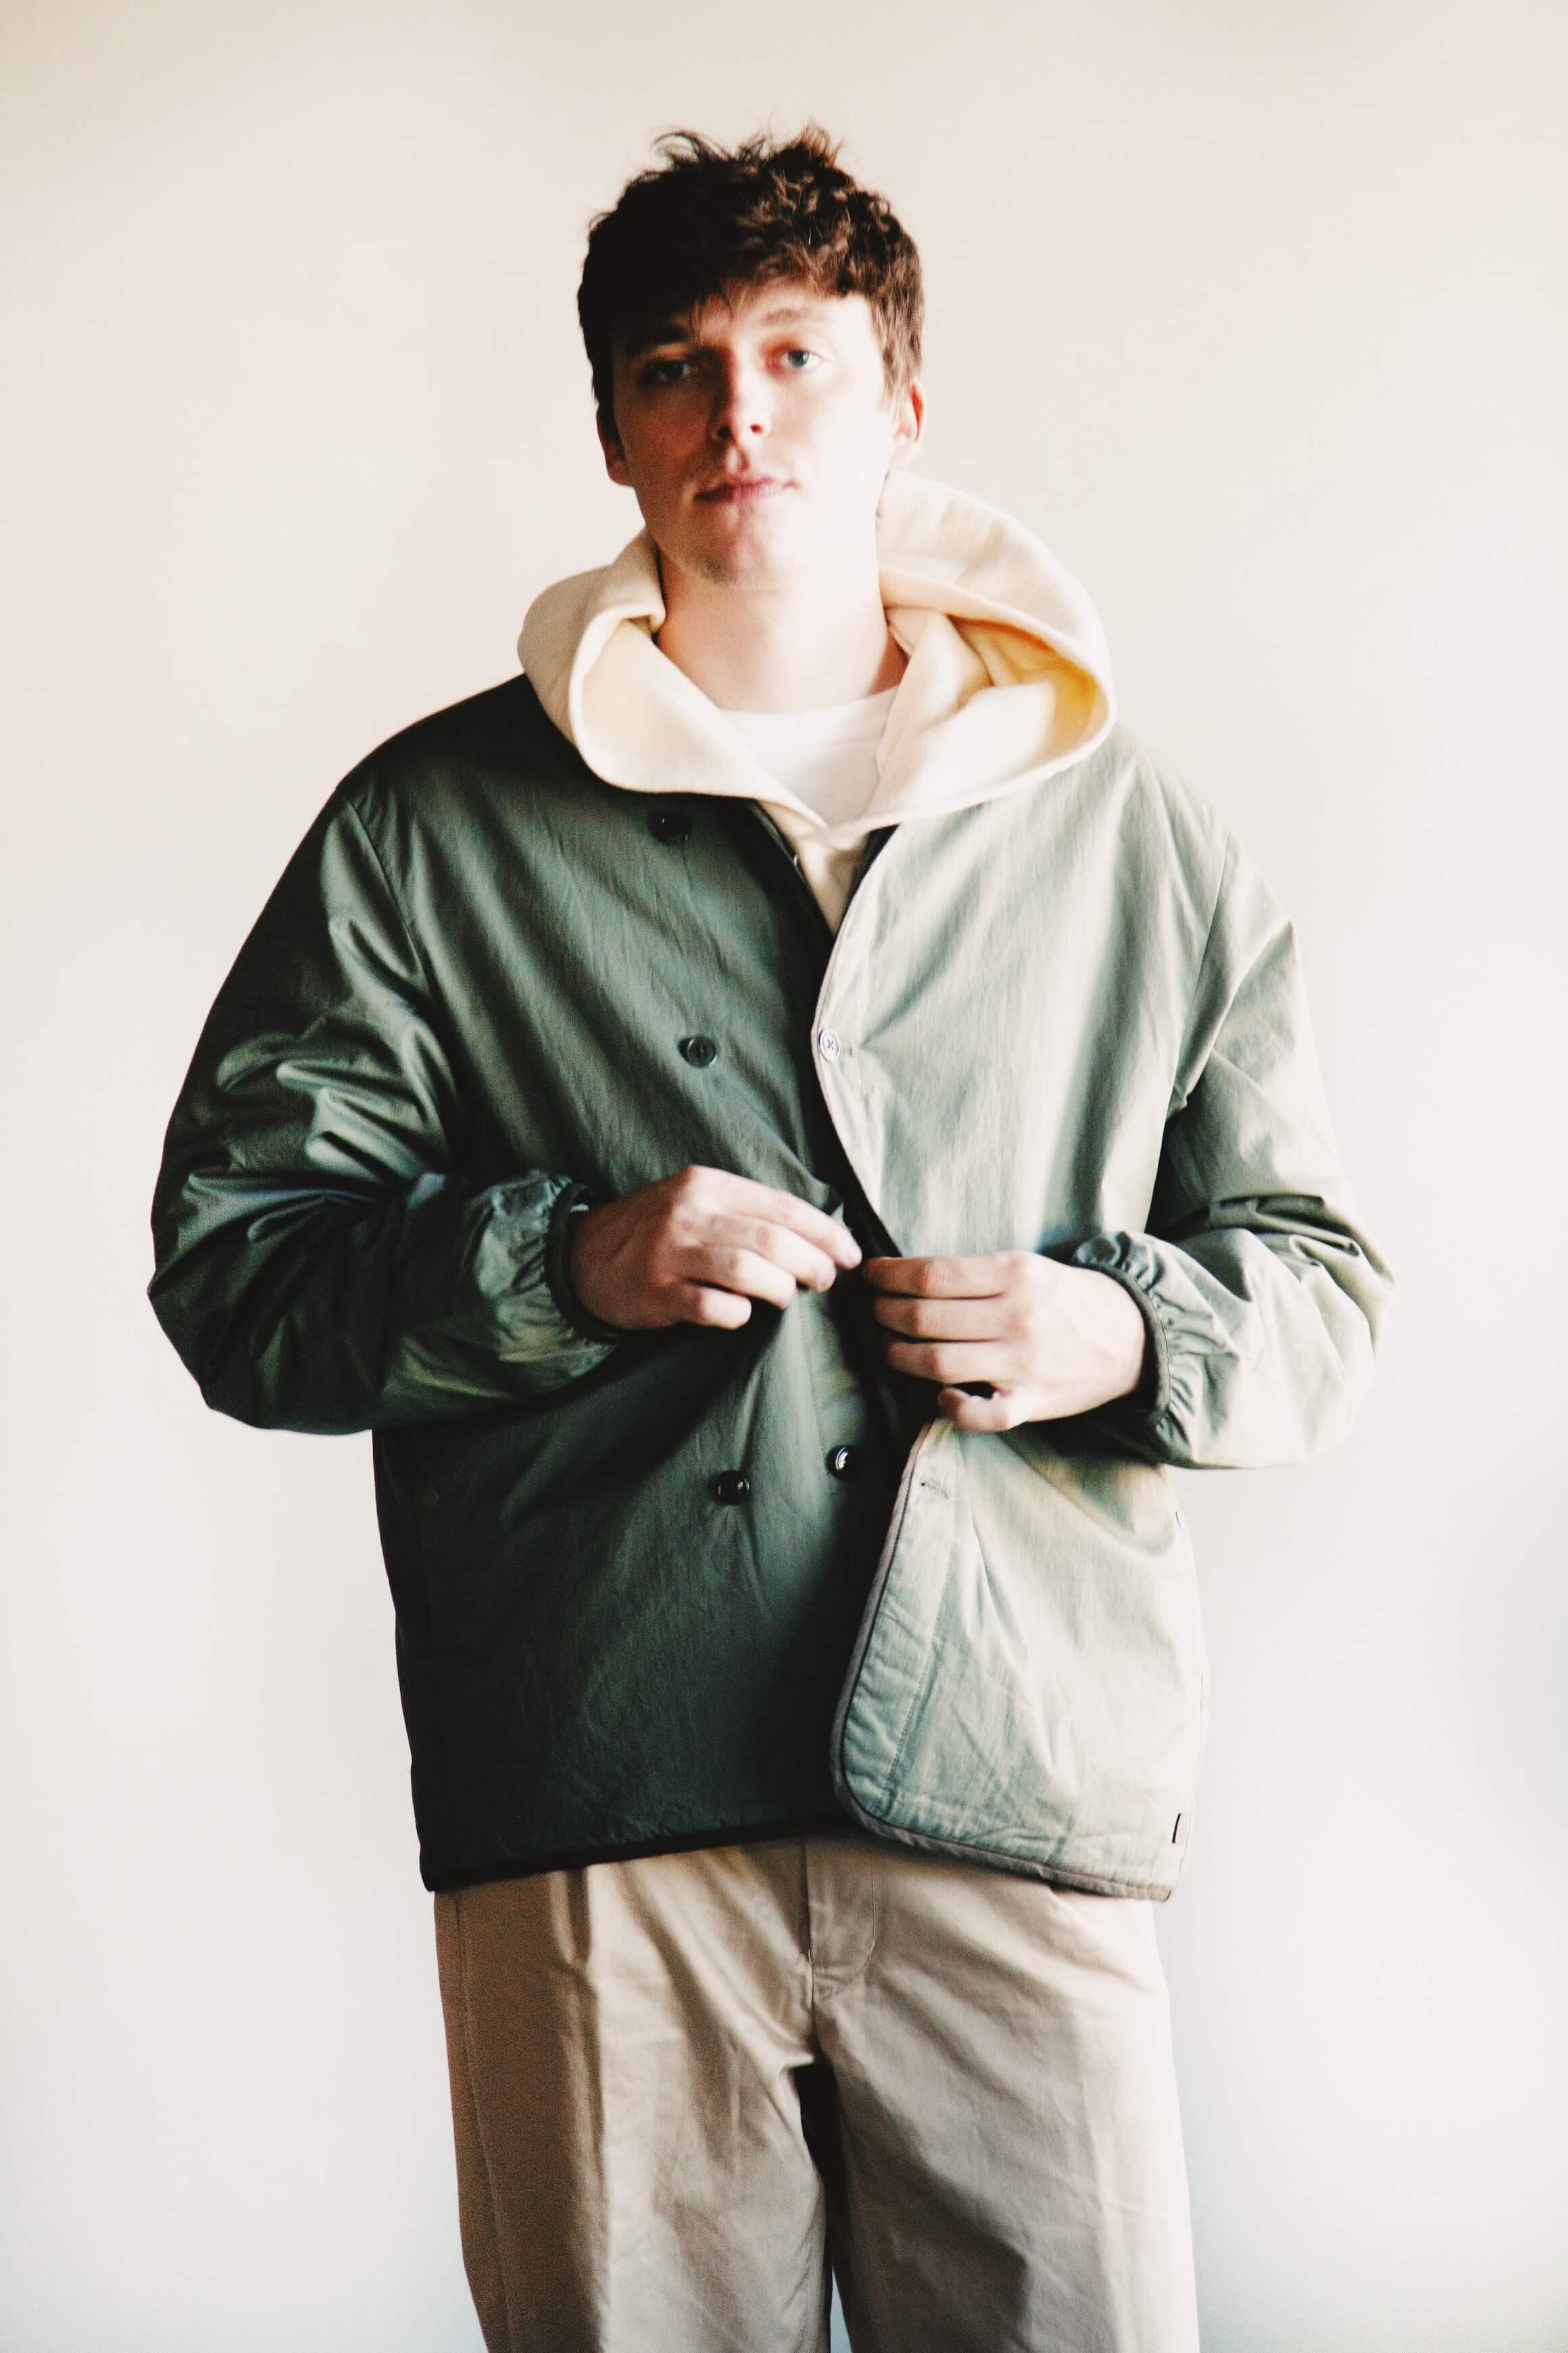 Nanamica down cardigan, visvim amplus hoodie po, beams plus single pleat twill pants on body